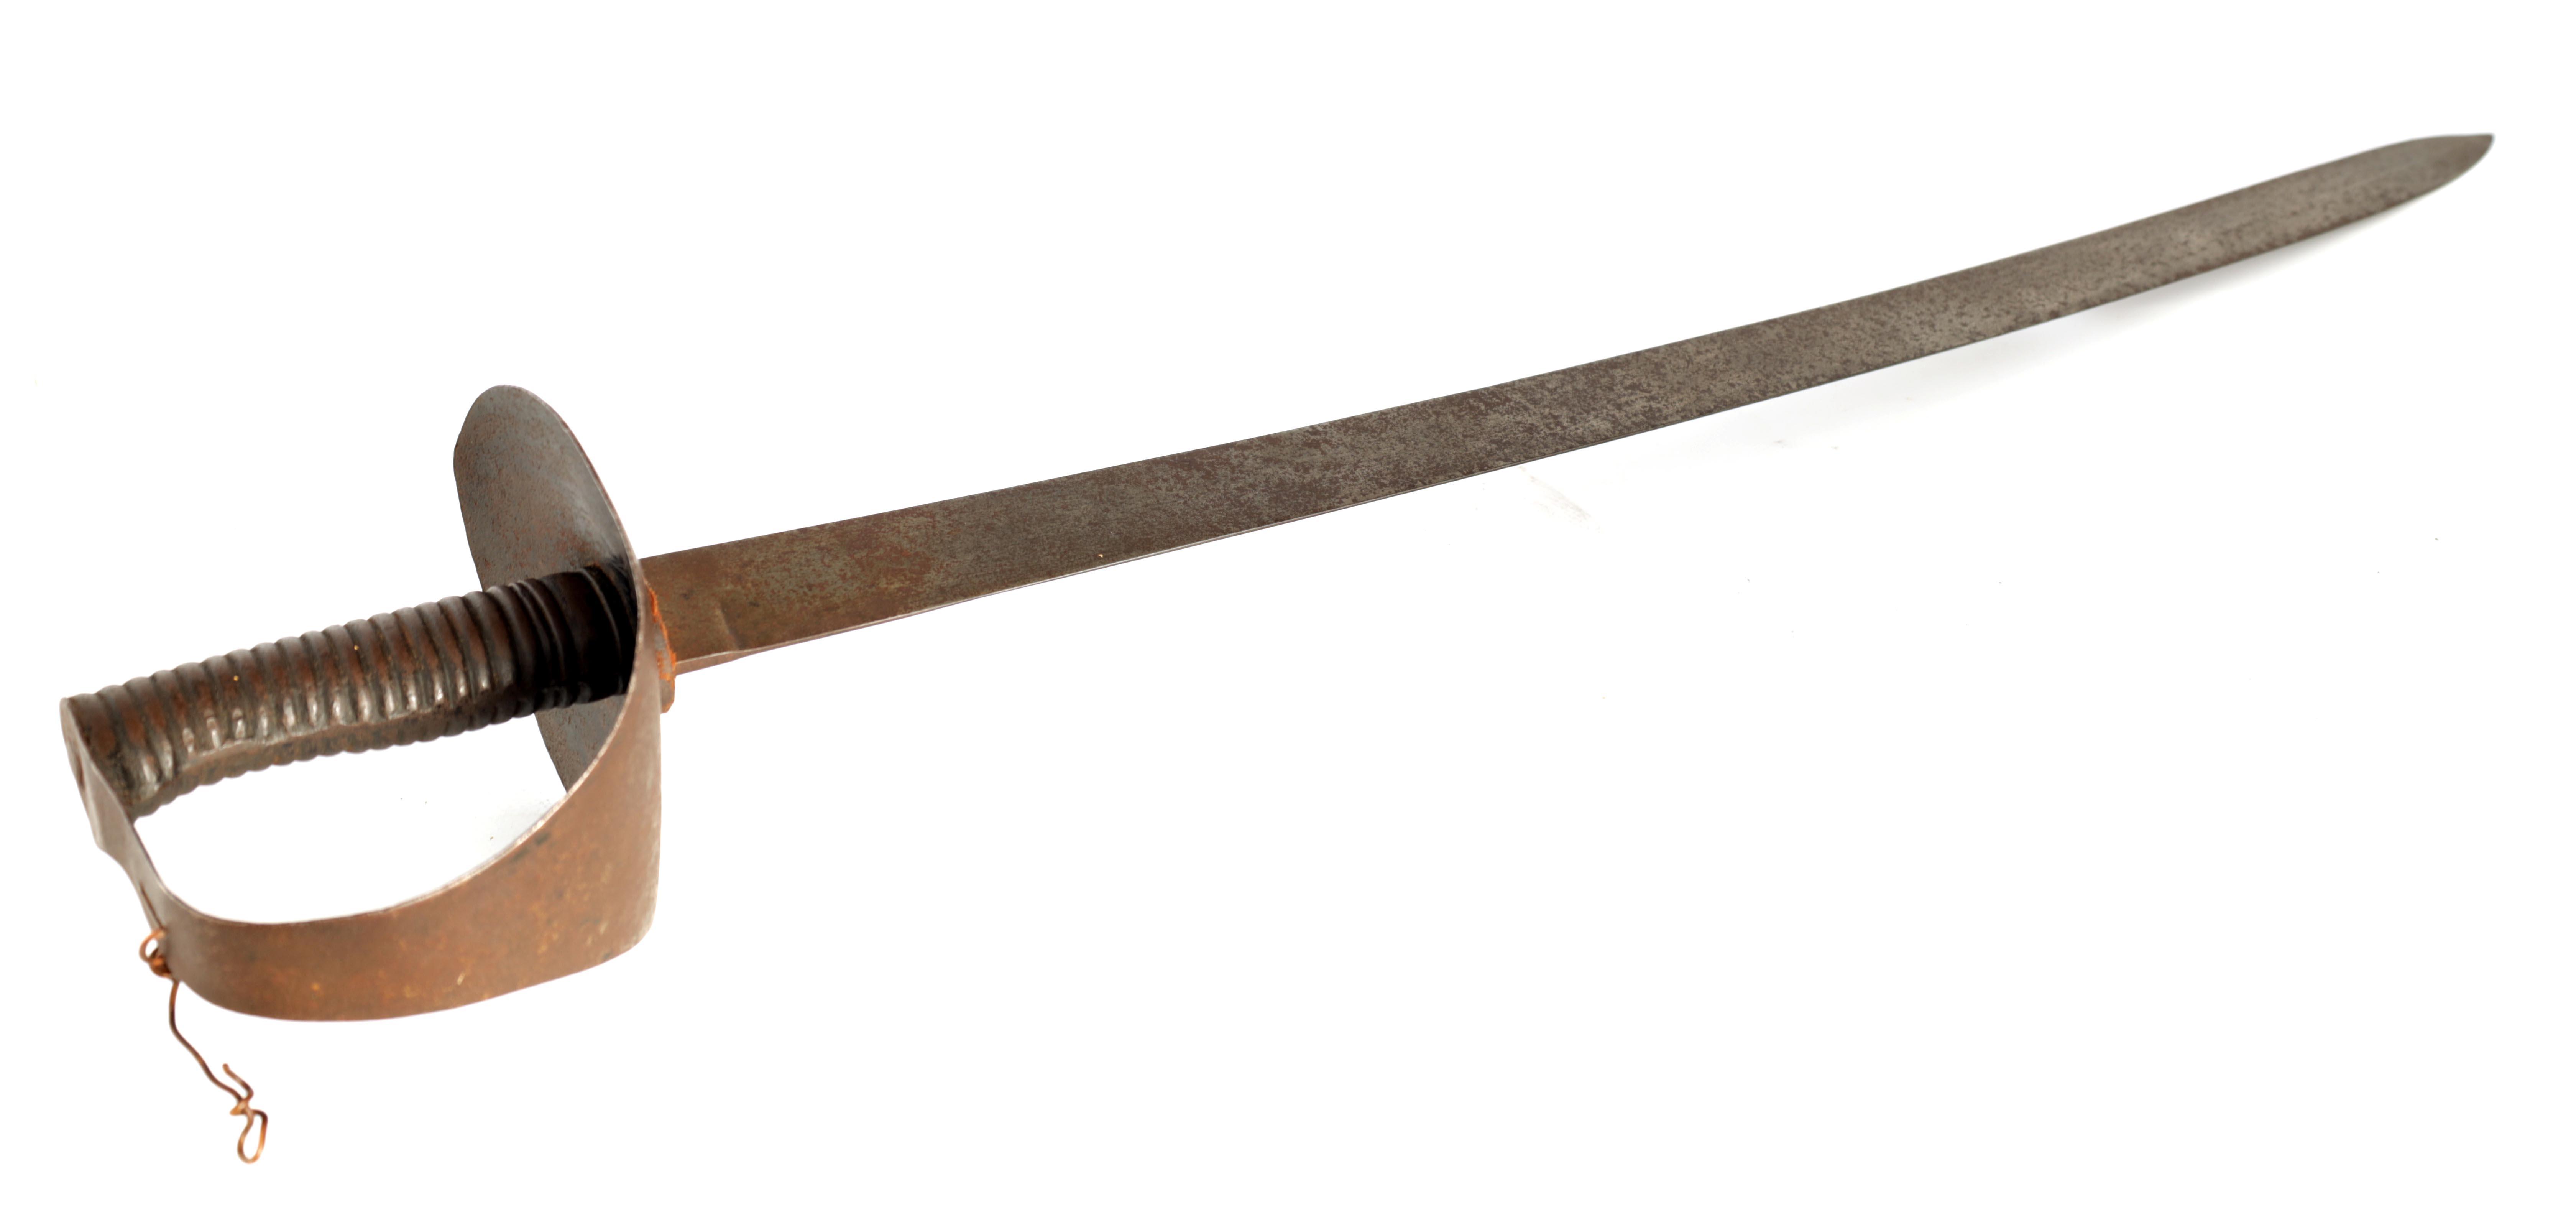 A LATE GEORGE III NAVAL CUTLASS having a slightly curved steel single-edged blade on a ribbed grip